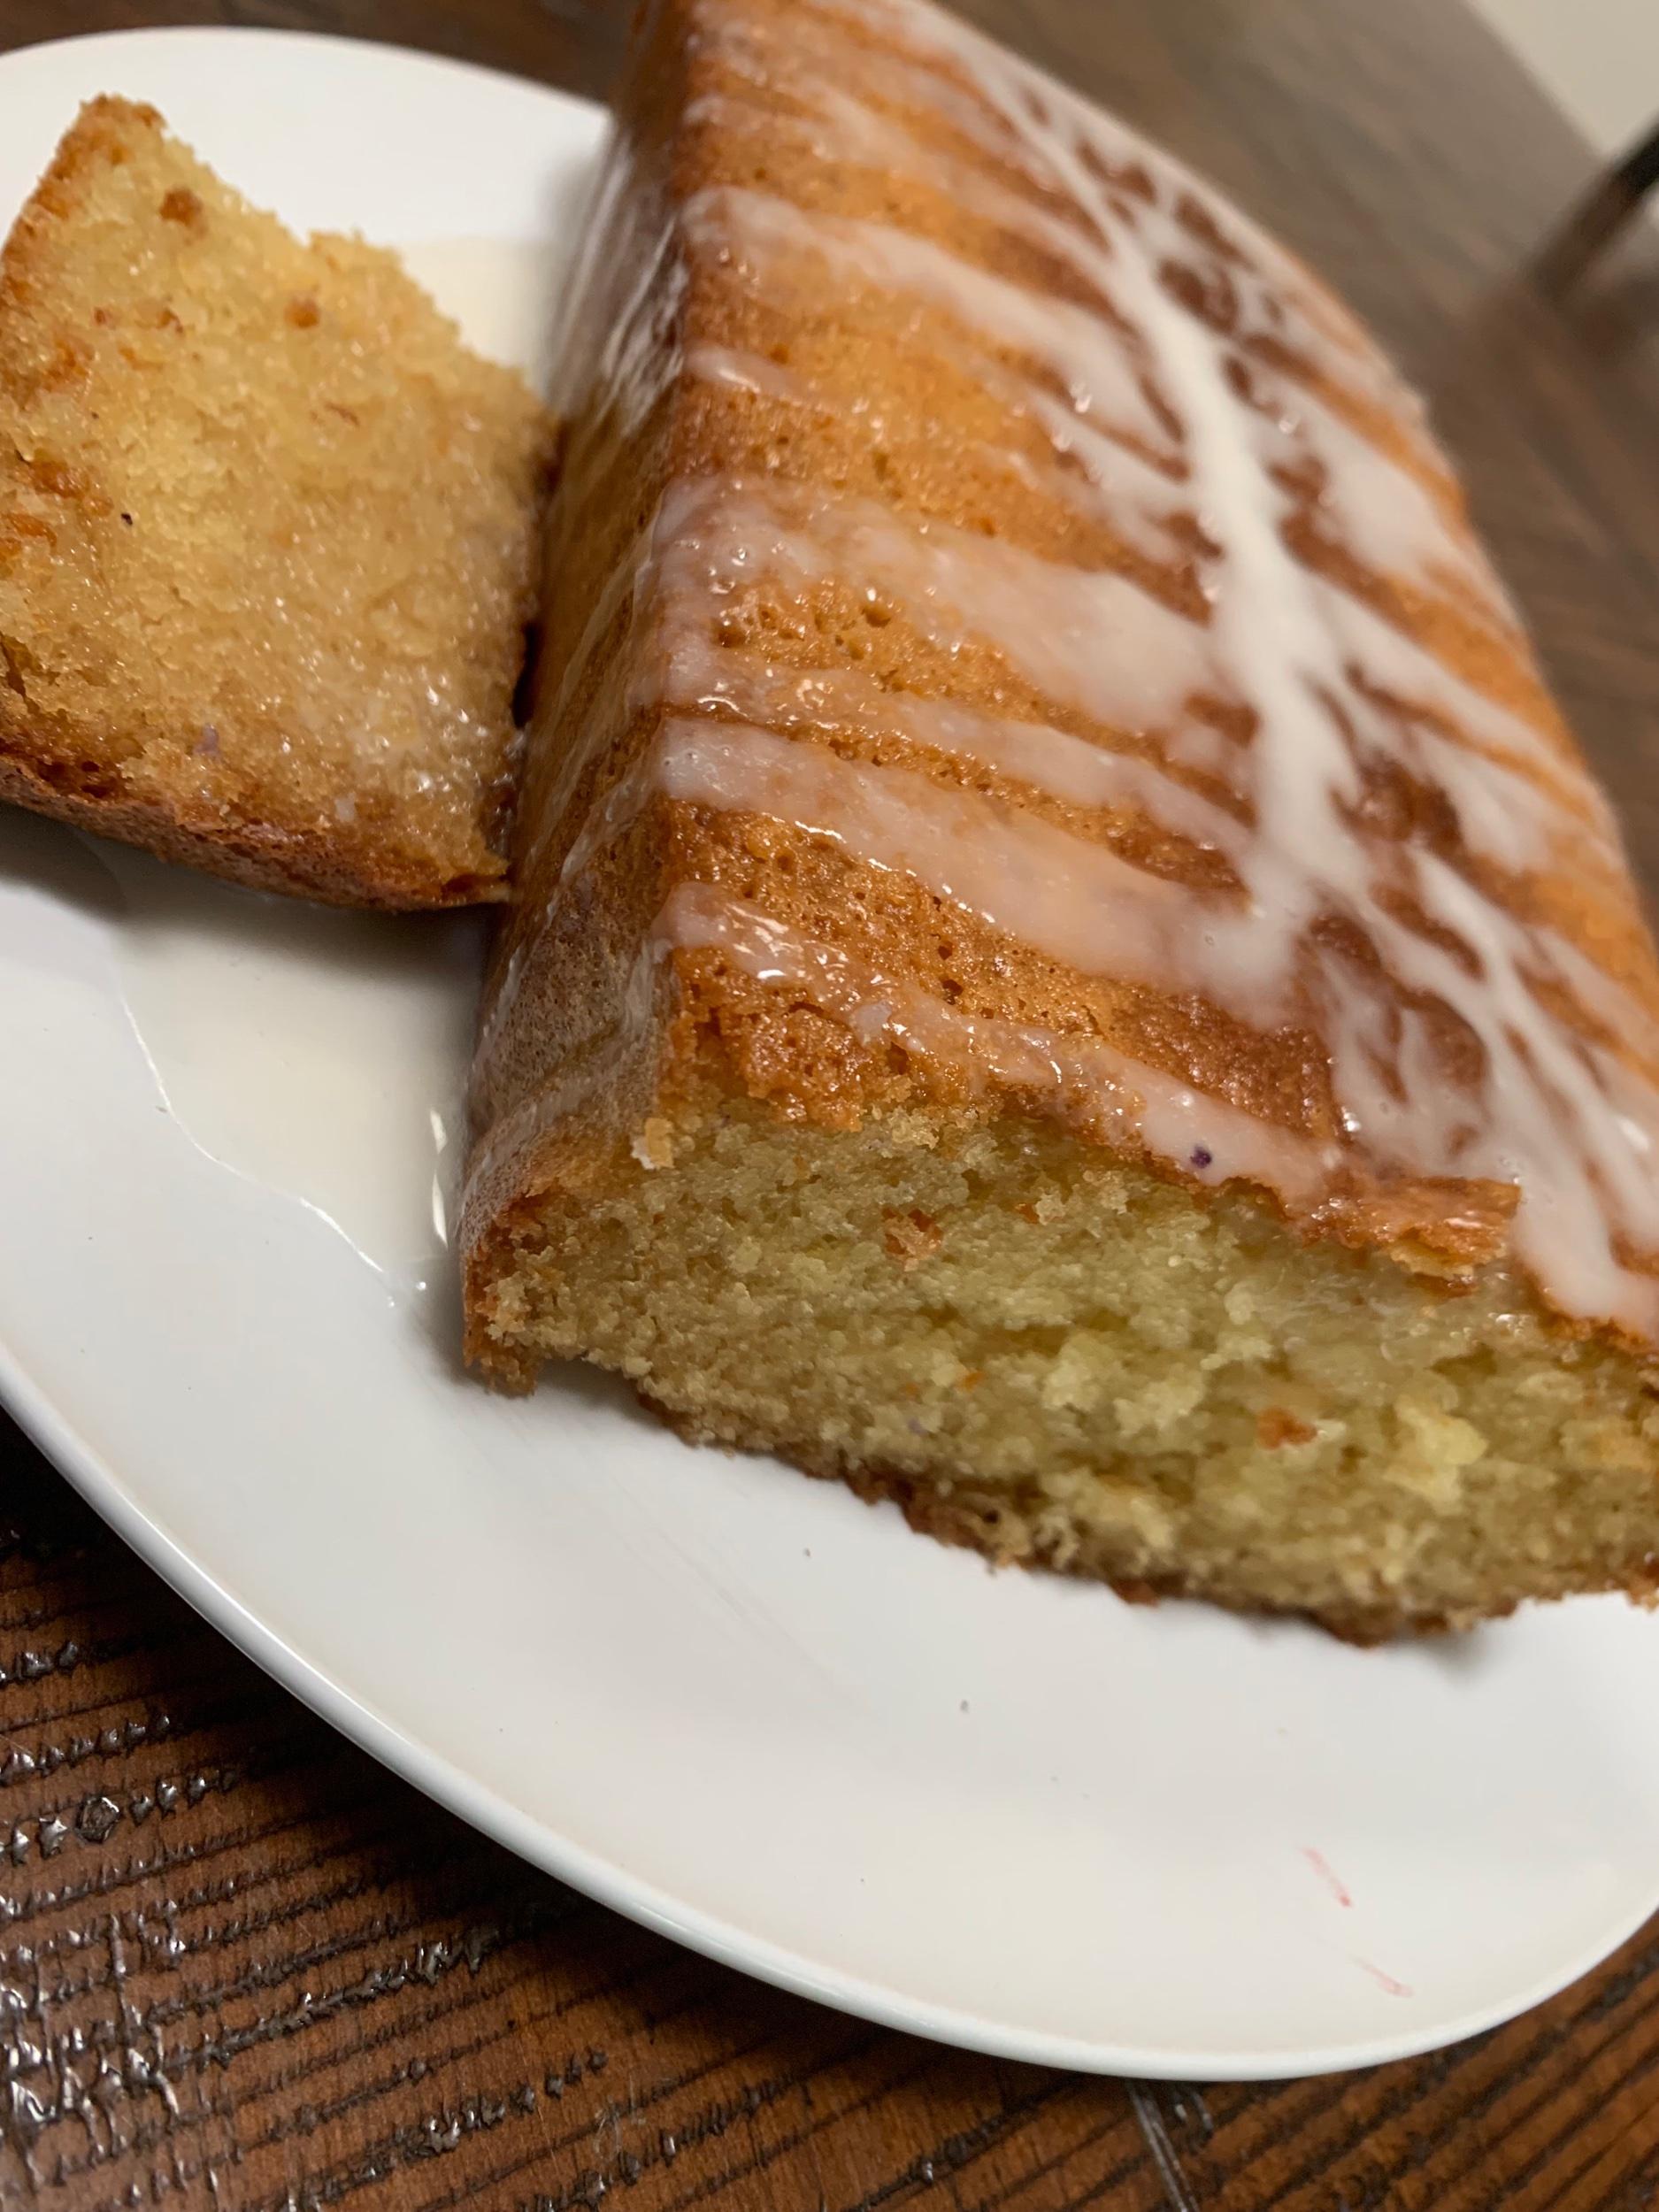 Sour Cream Lemon Loaf - We added a little glaze for extra goodness